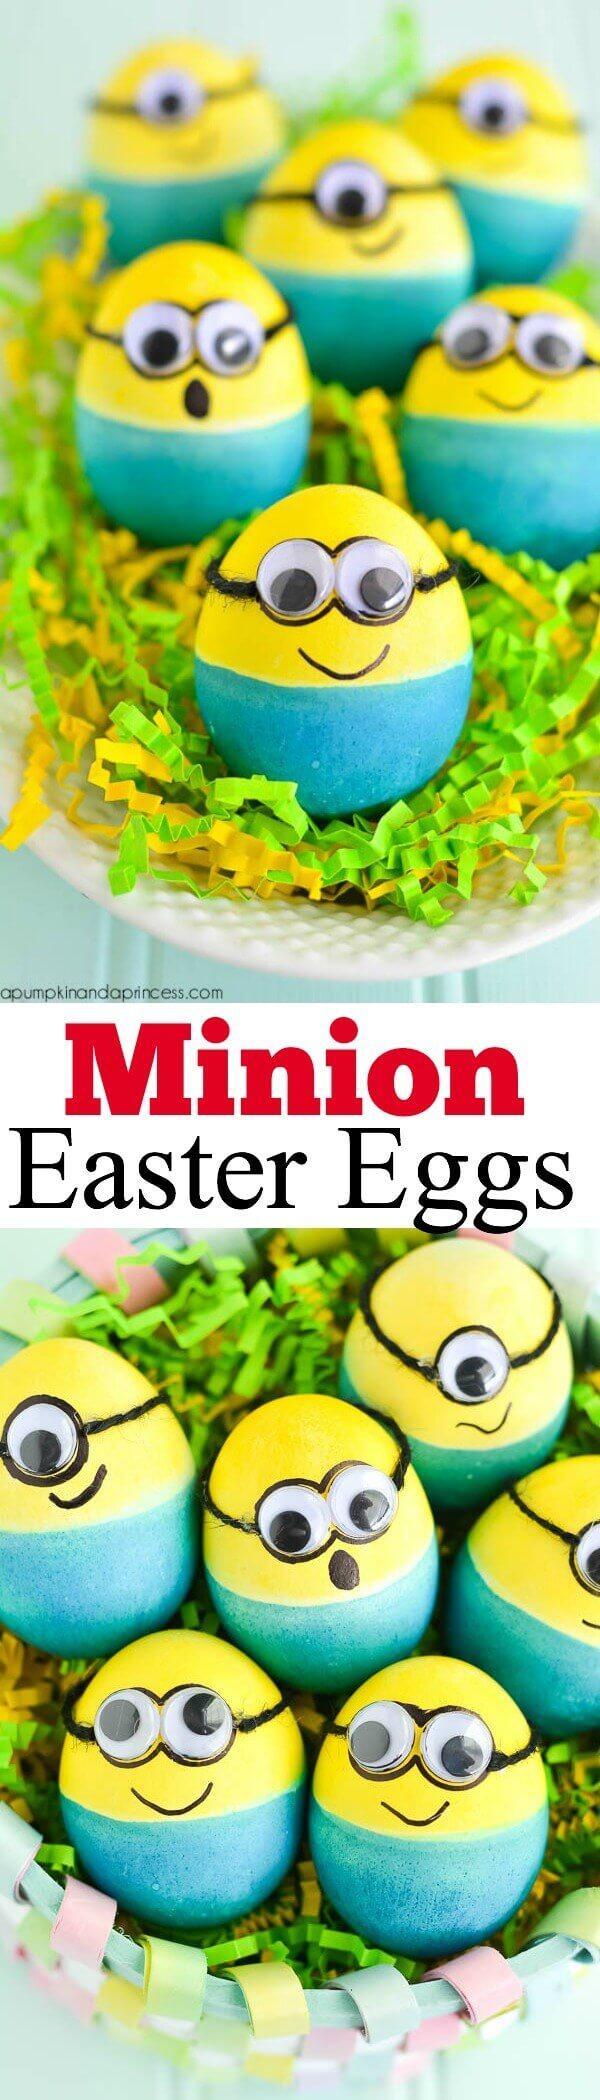 Adorable Minion Easter Egg decorating idea